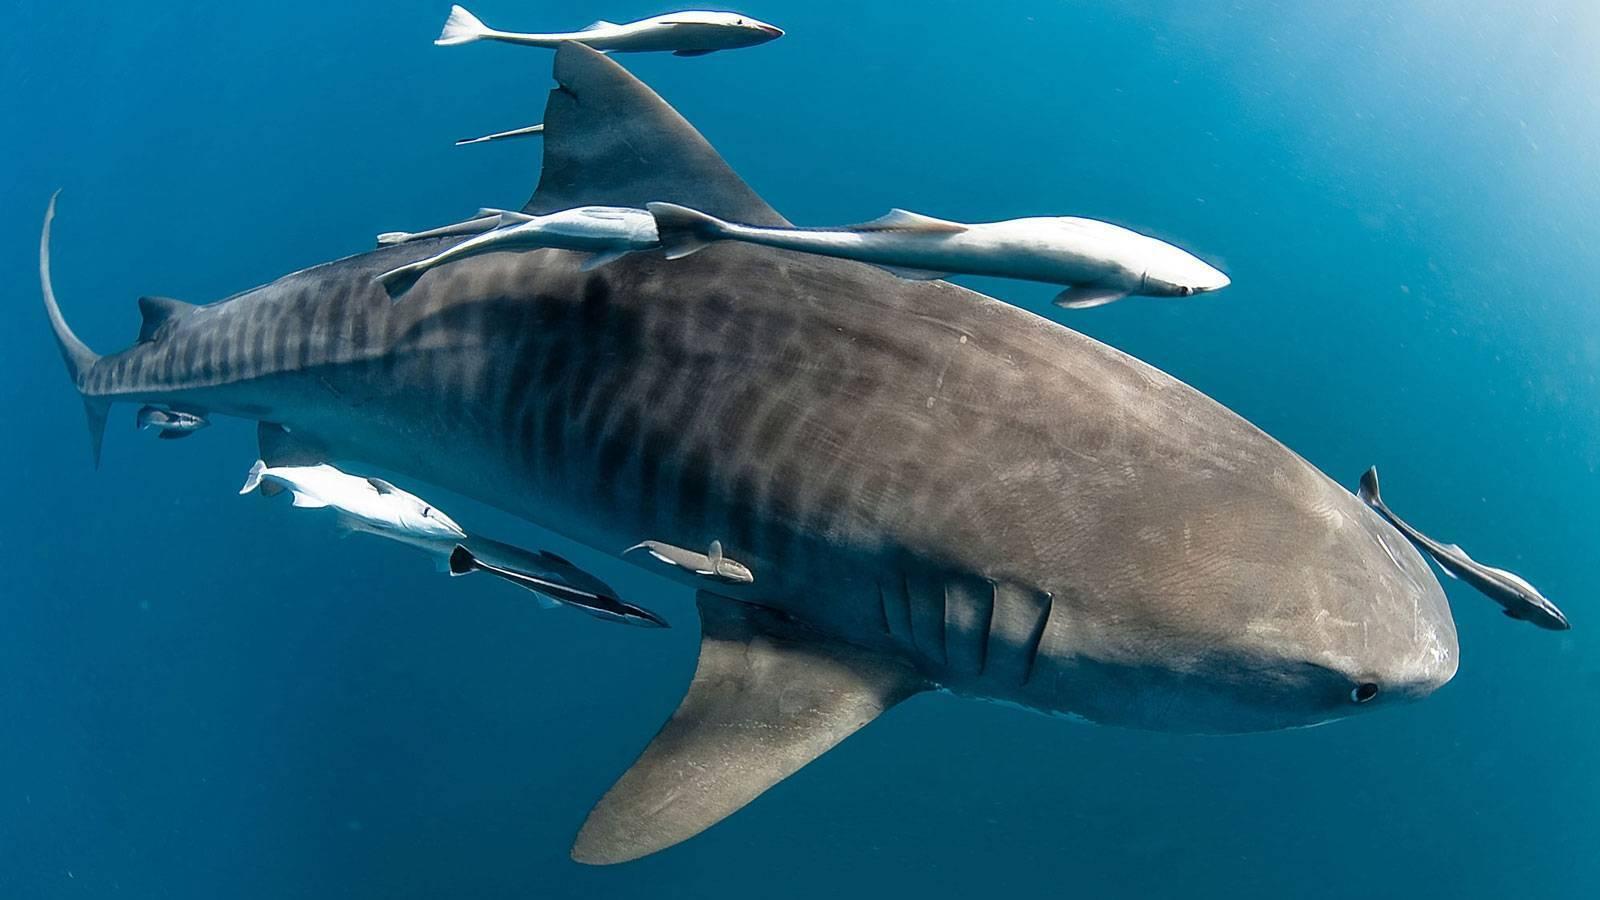 Спутники акулы - лоцманы и рыбы-прилипалы ∞ лагуна акул